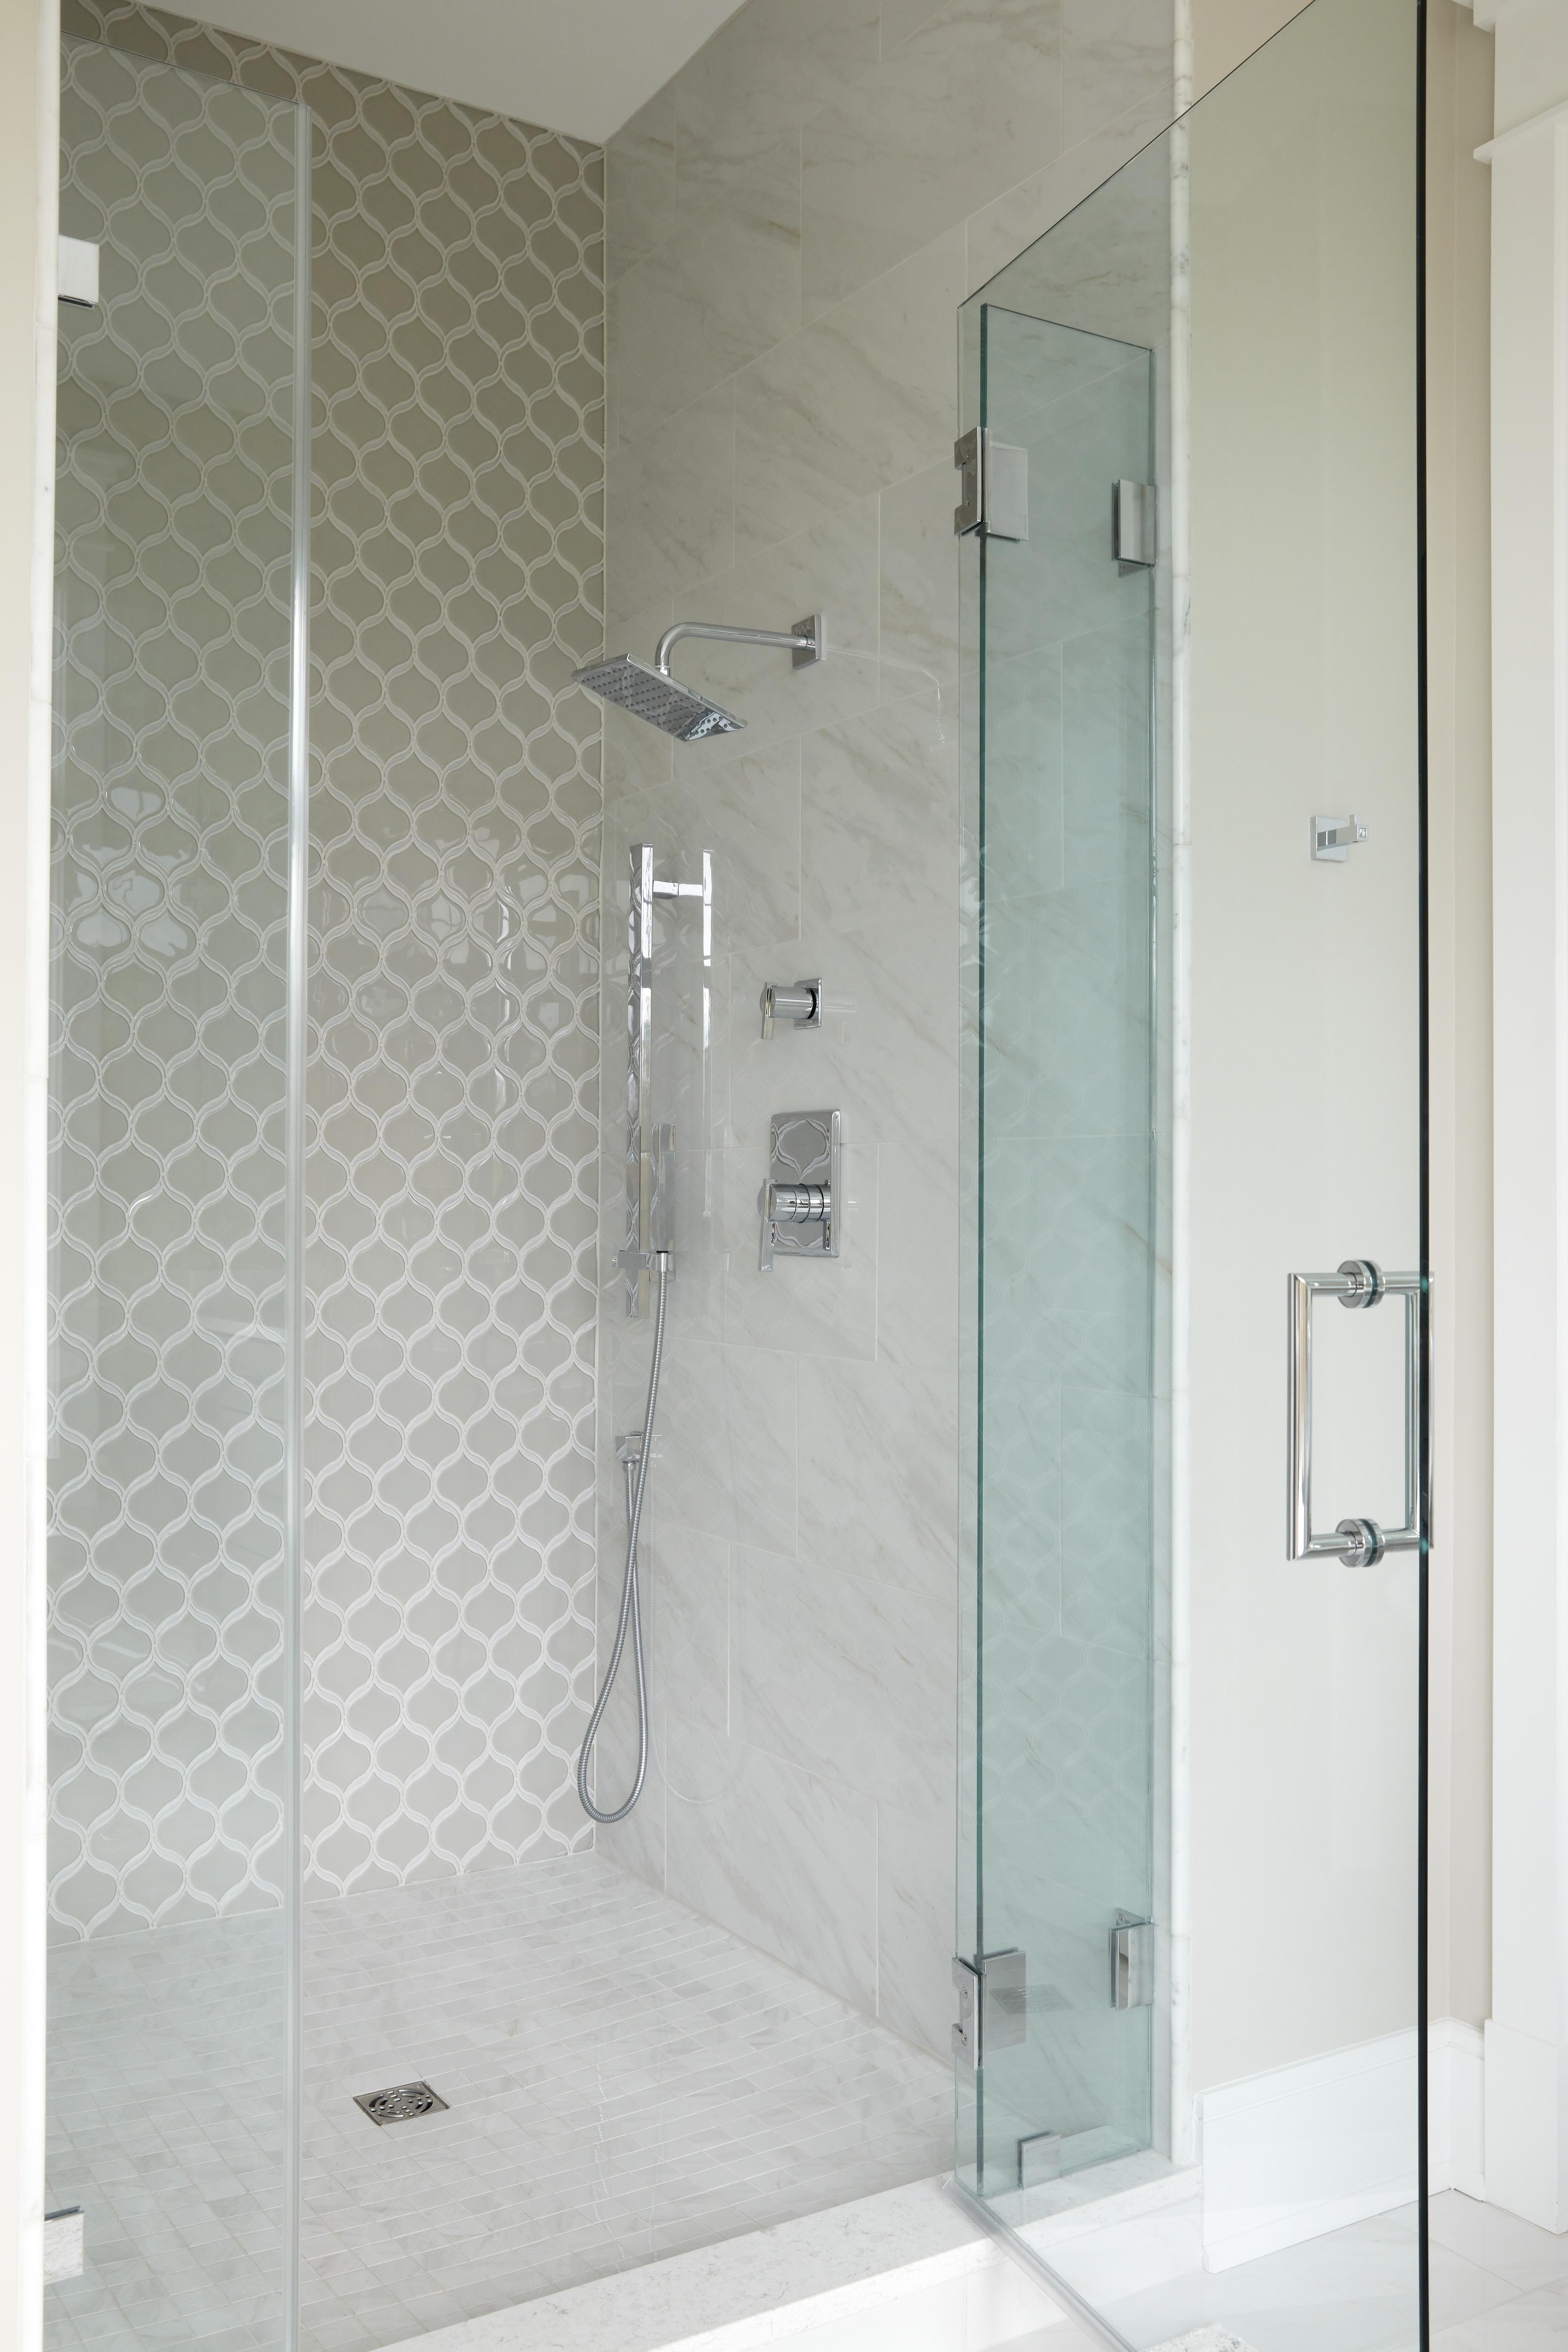 Frederick Master Bath Shower fixtures and Tile detail